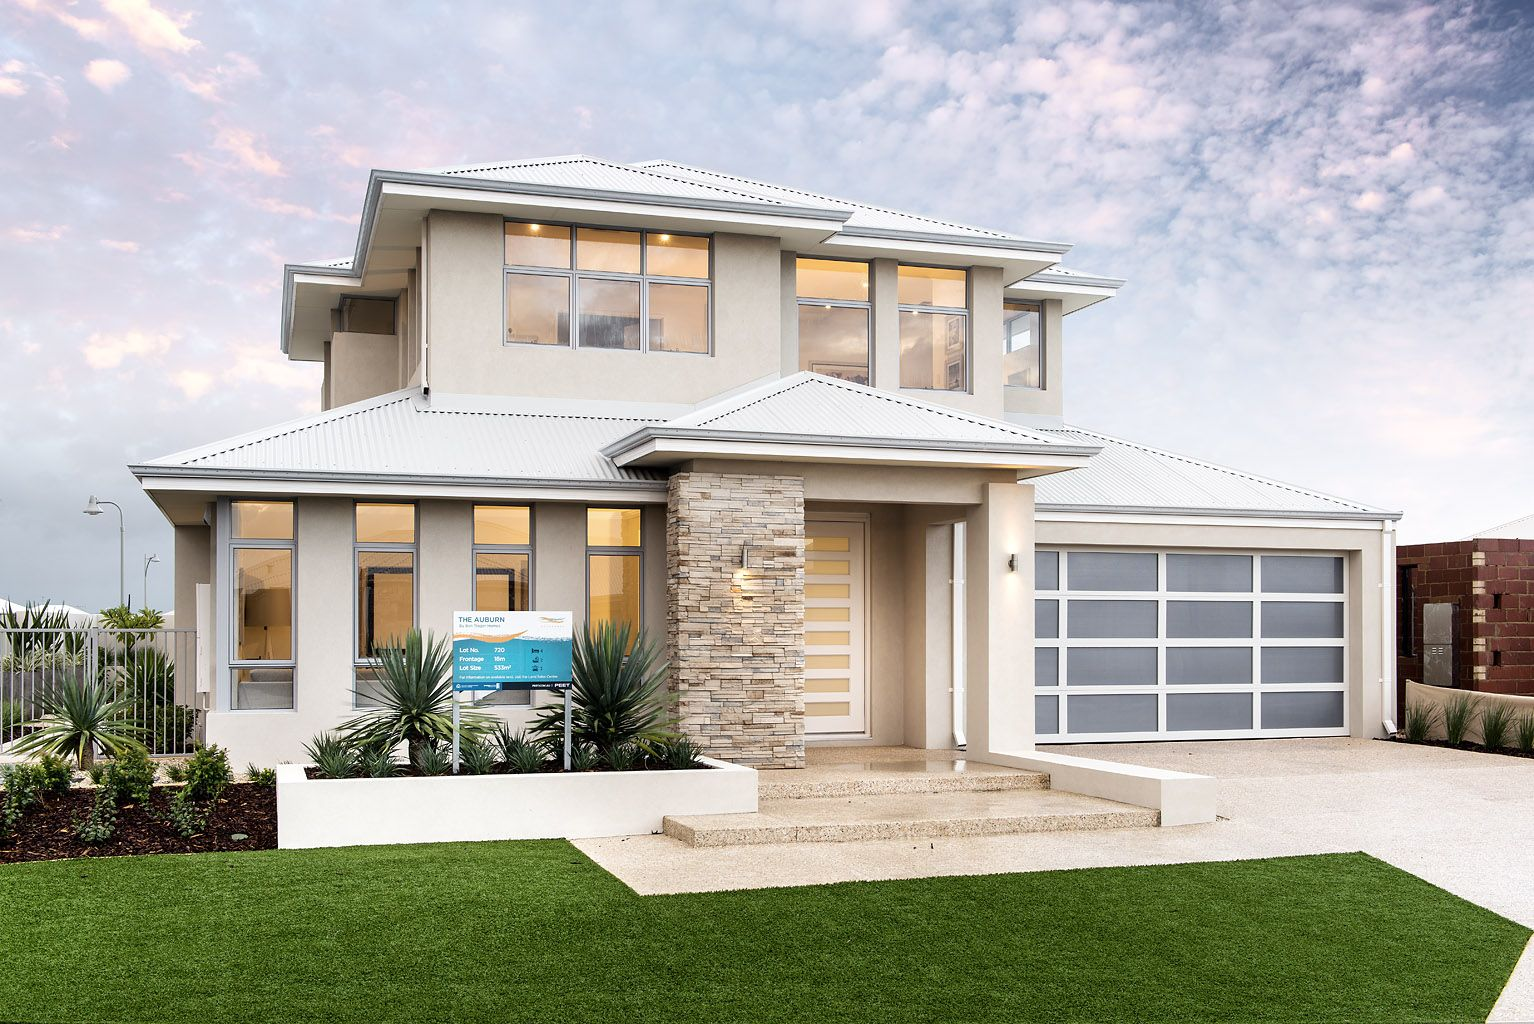 Auburn Ben Trager Homes Perth Display Home